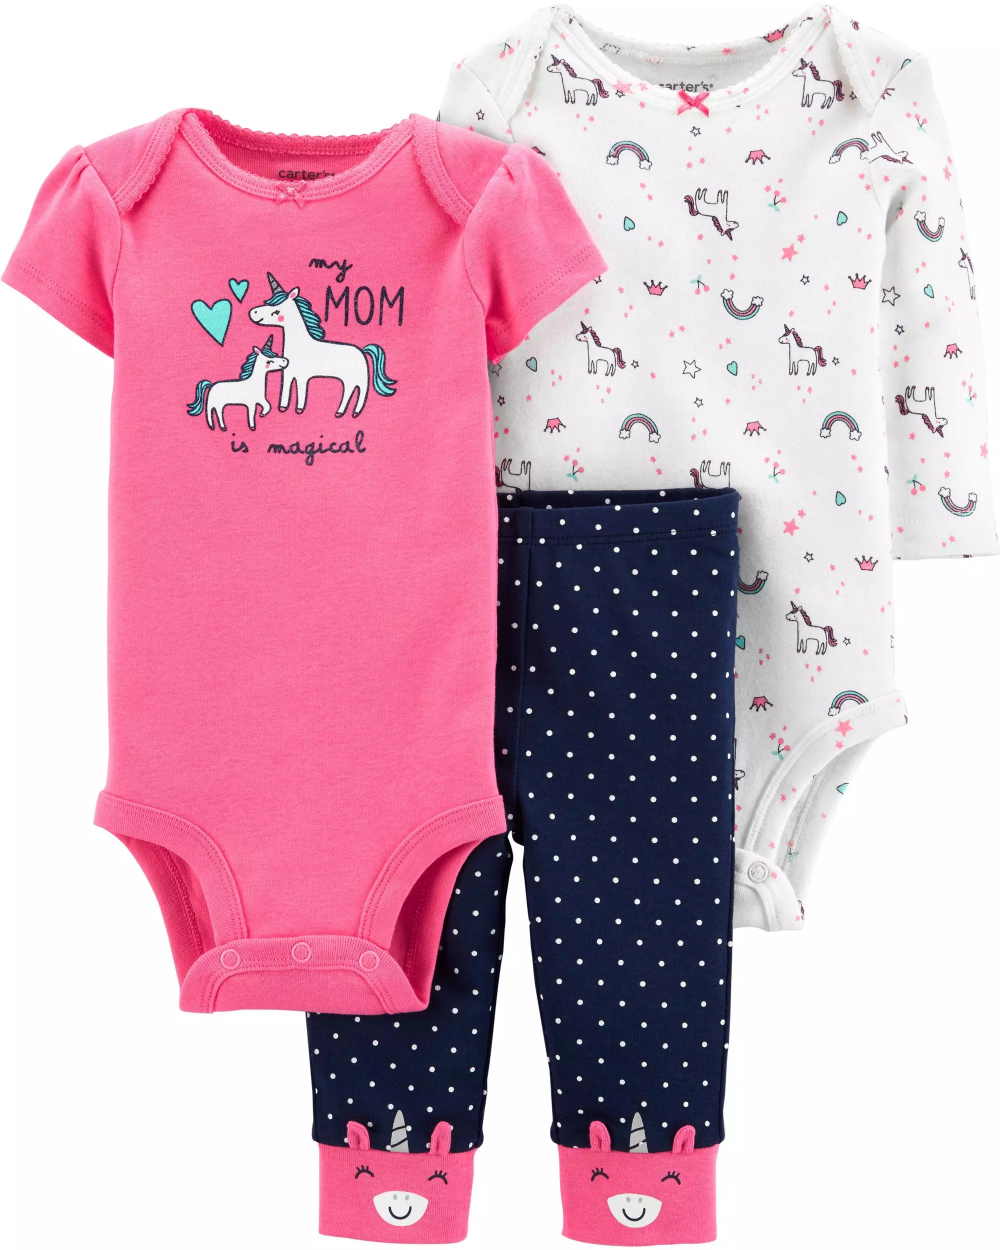 Unisex Baby Short-Sleeve One-Piece Suit Unicorns Cotton Bodysuits